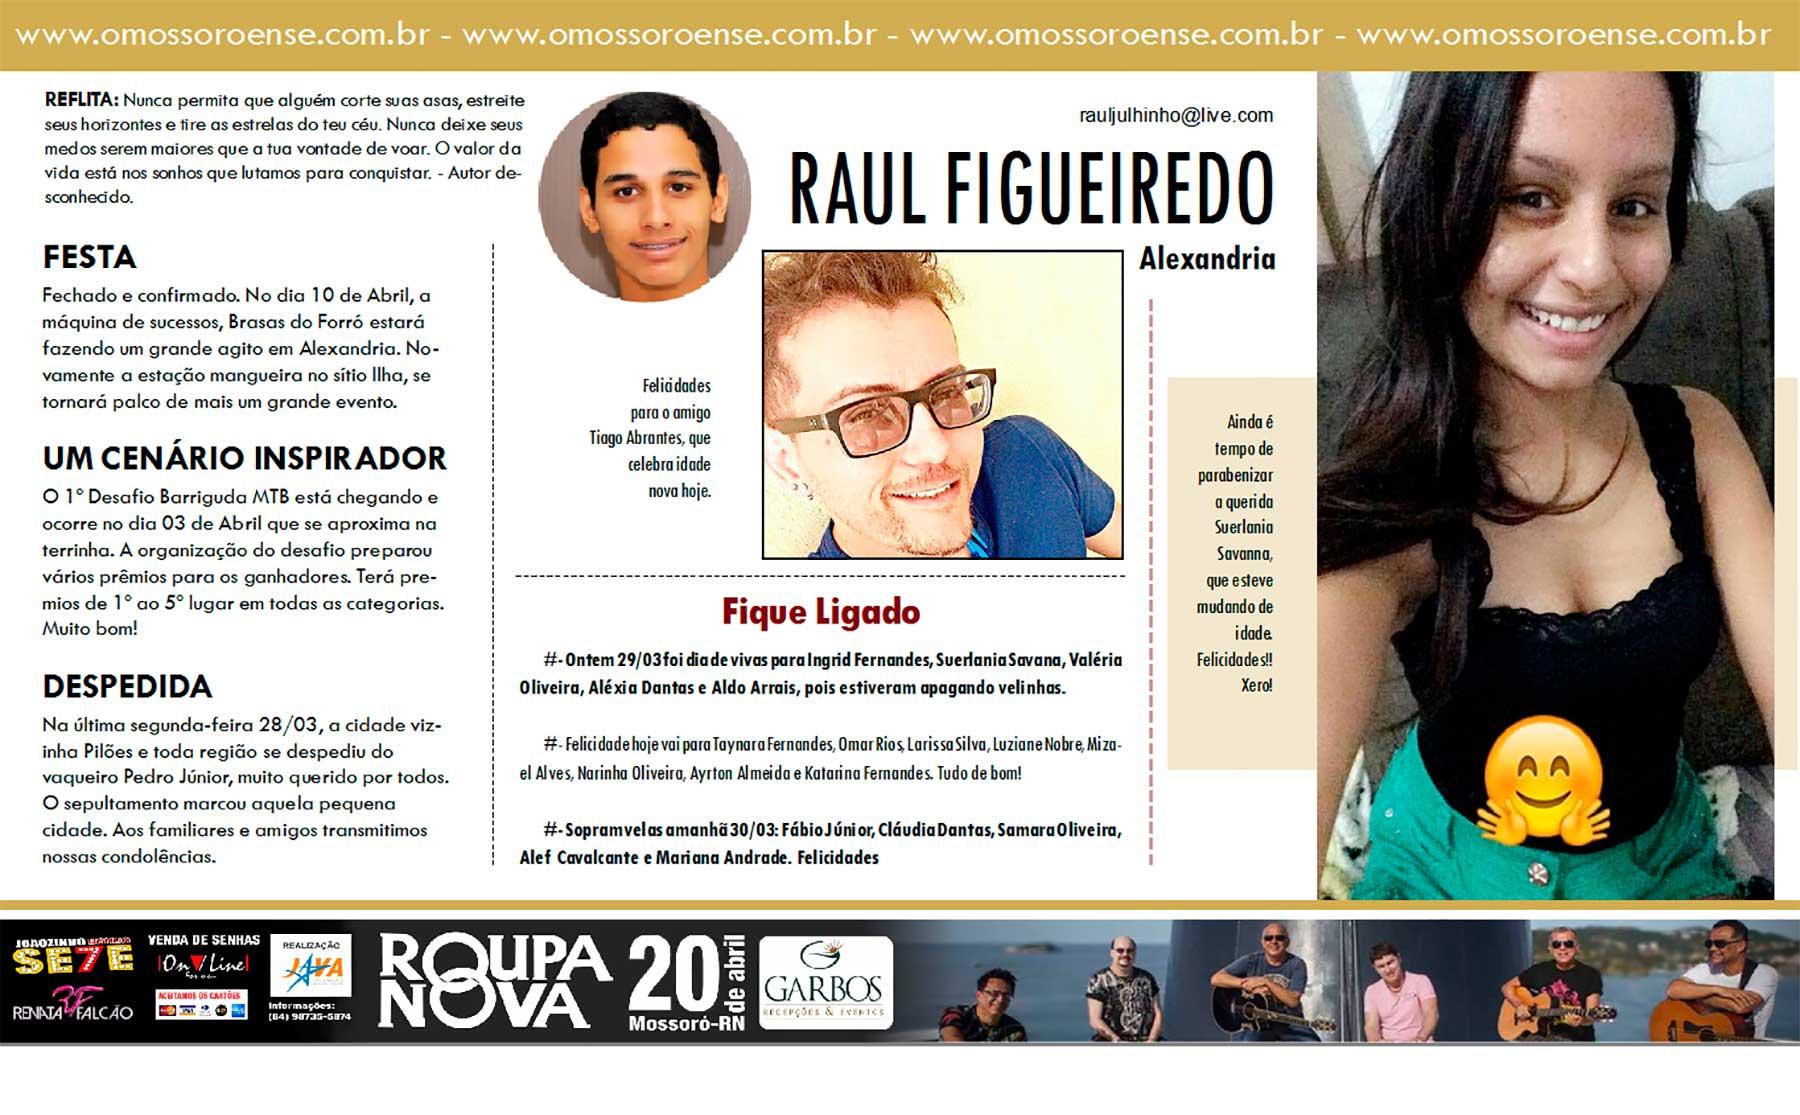 RAUL-FIGUEIREDO---29-03-2016